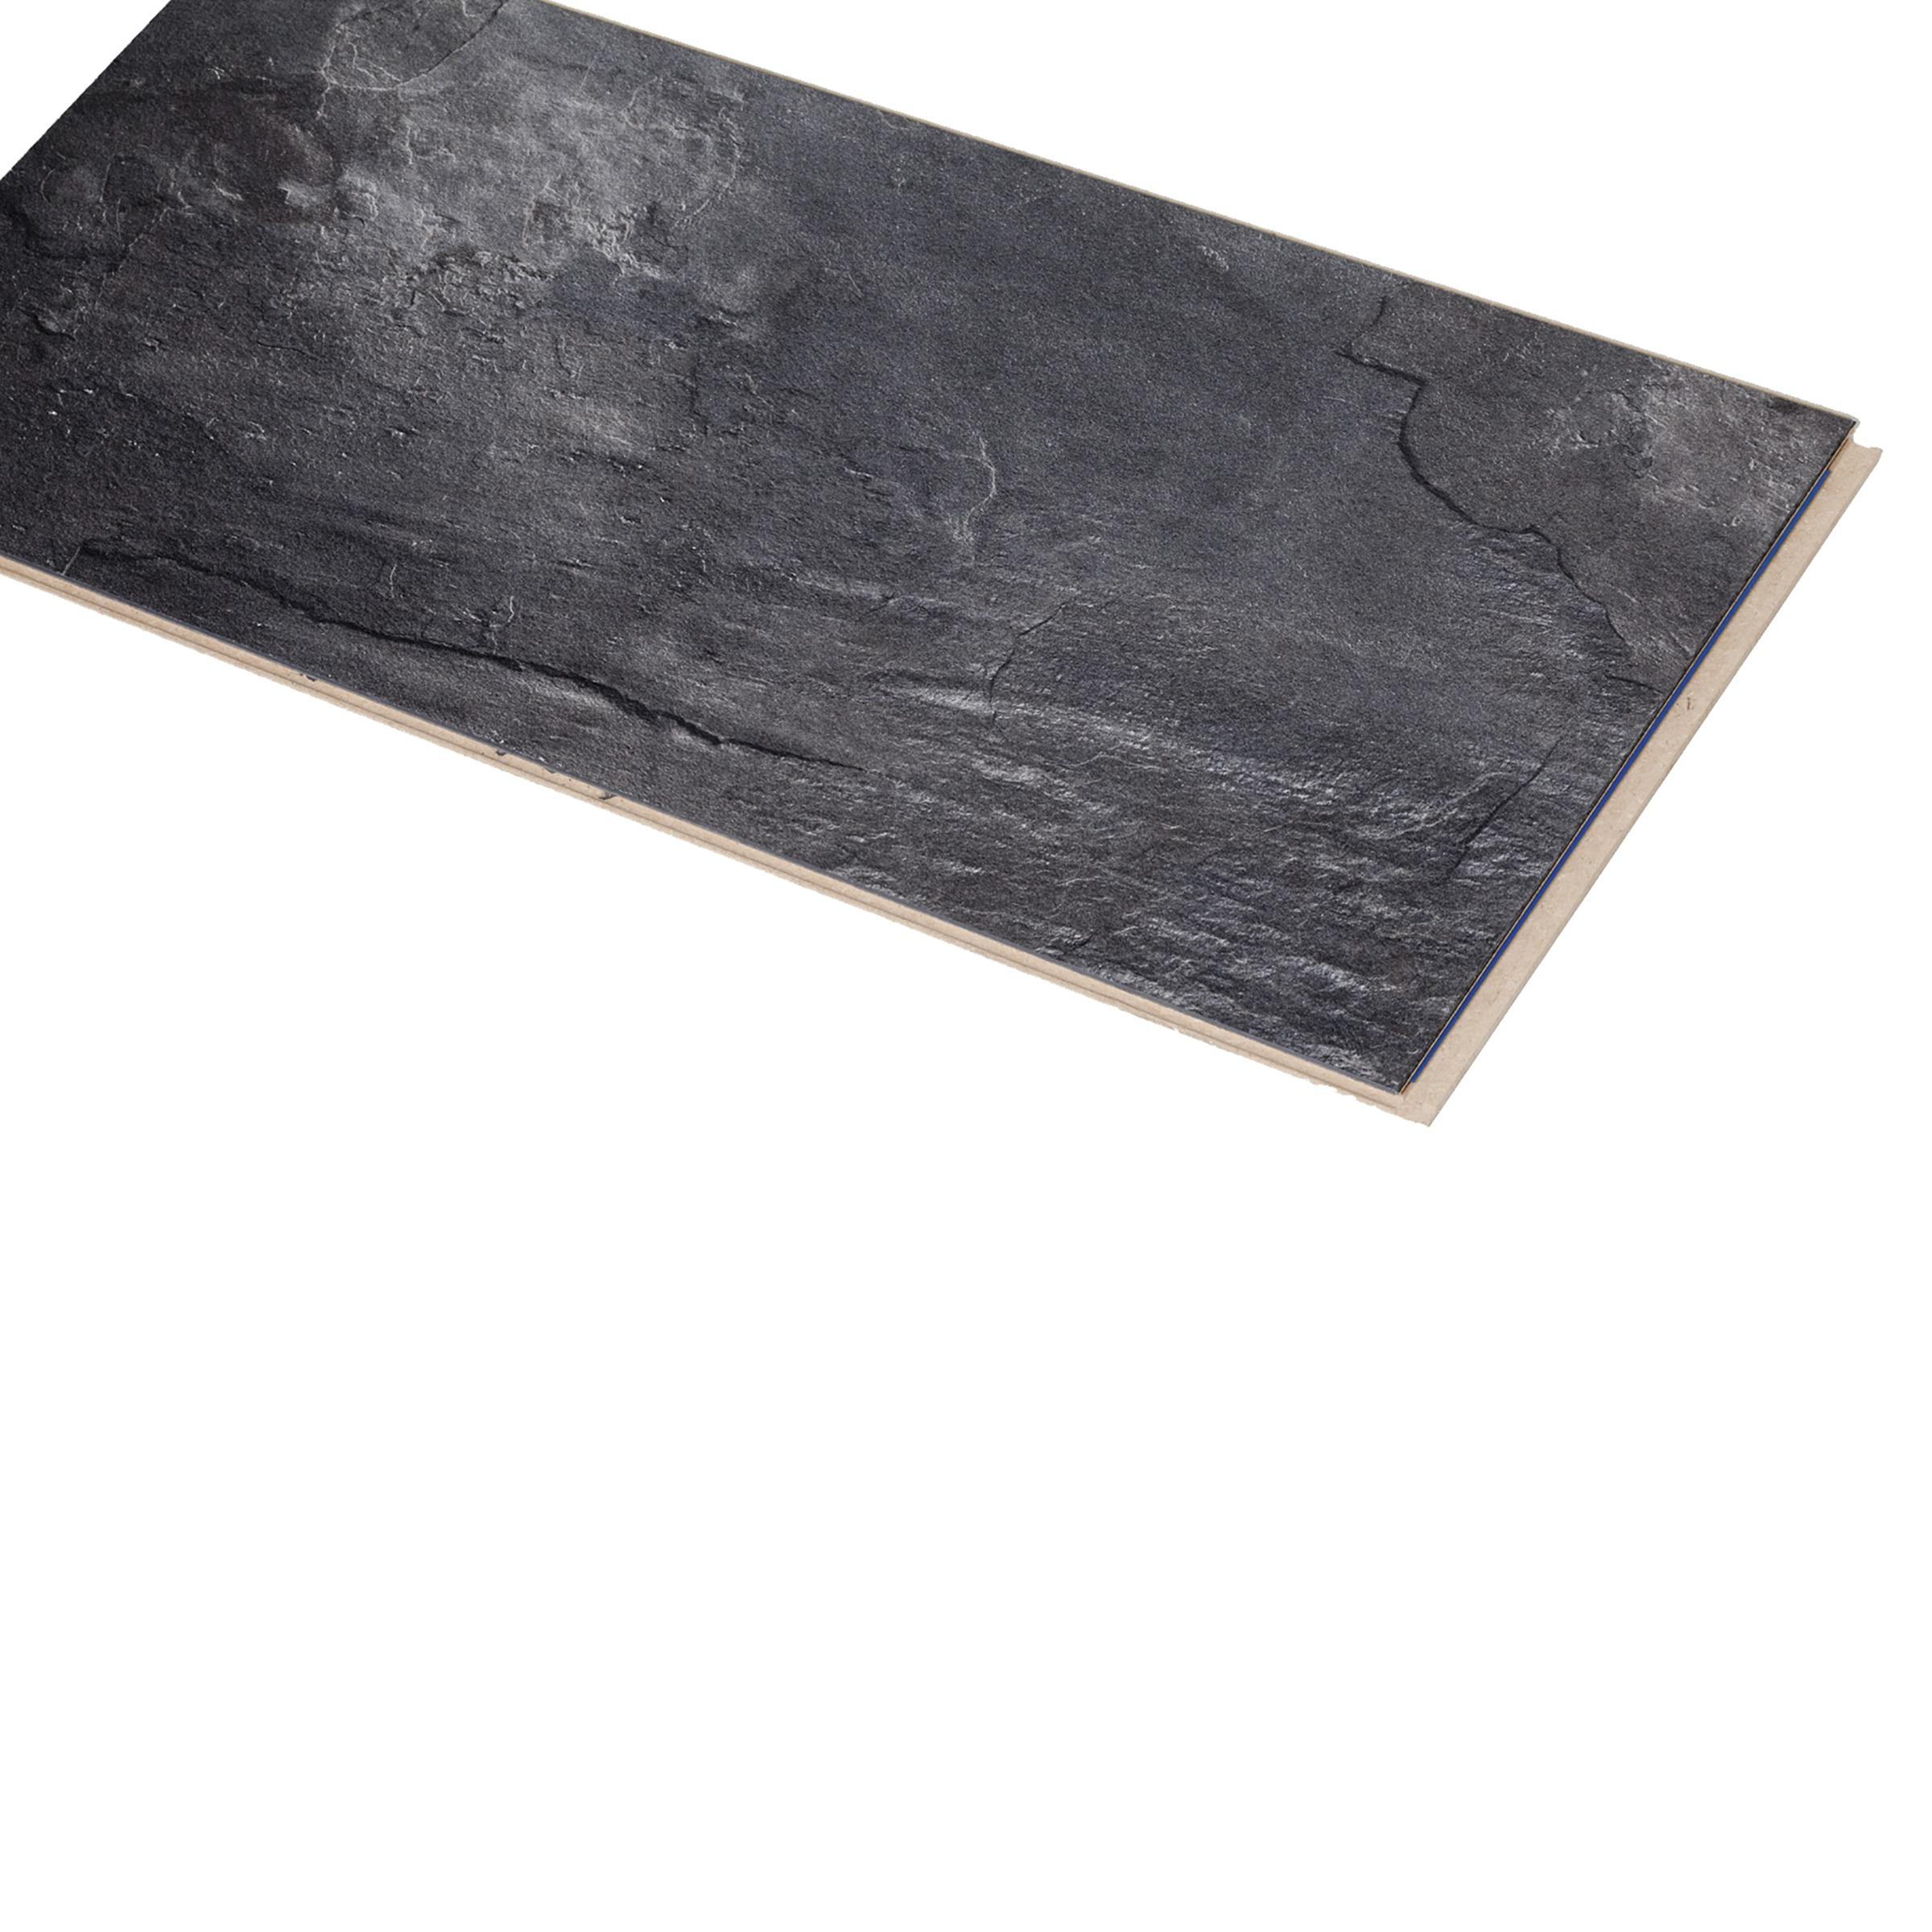 GAMMA Bastion laminaat met V groef antraciet 2,05 m u00b2 8mm   Laminaat   Vloeren   GAMMA